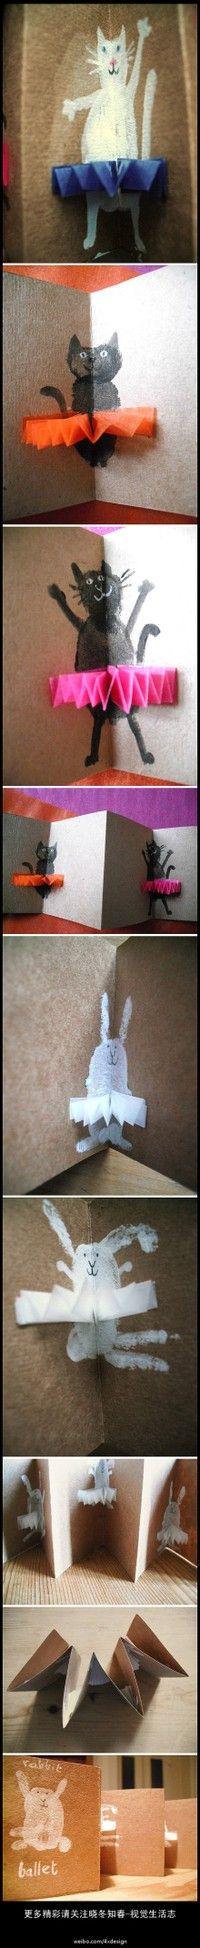 在Hazel Terry(Scotland)的flickr相册里面看到的ballet rabbits和ballet…